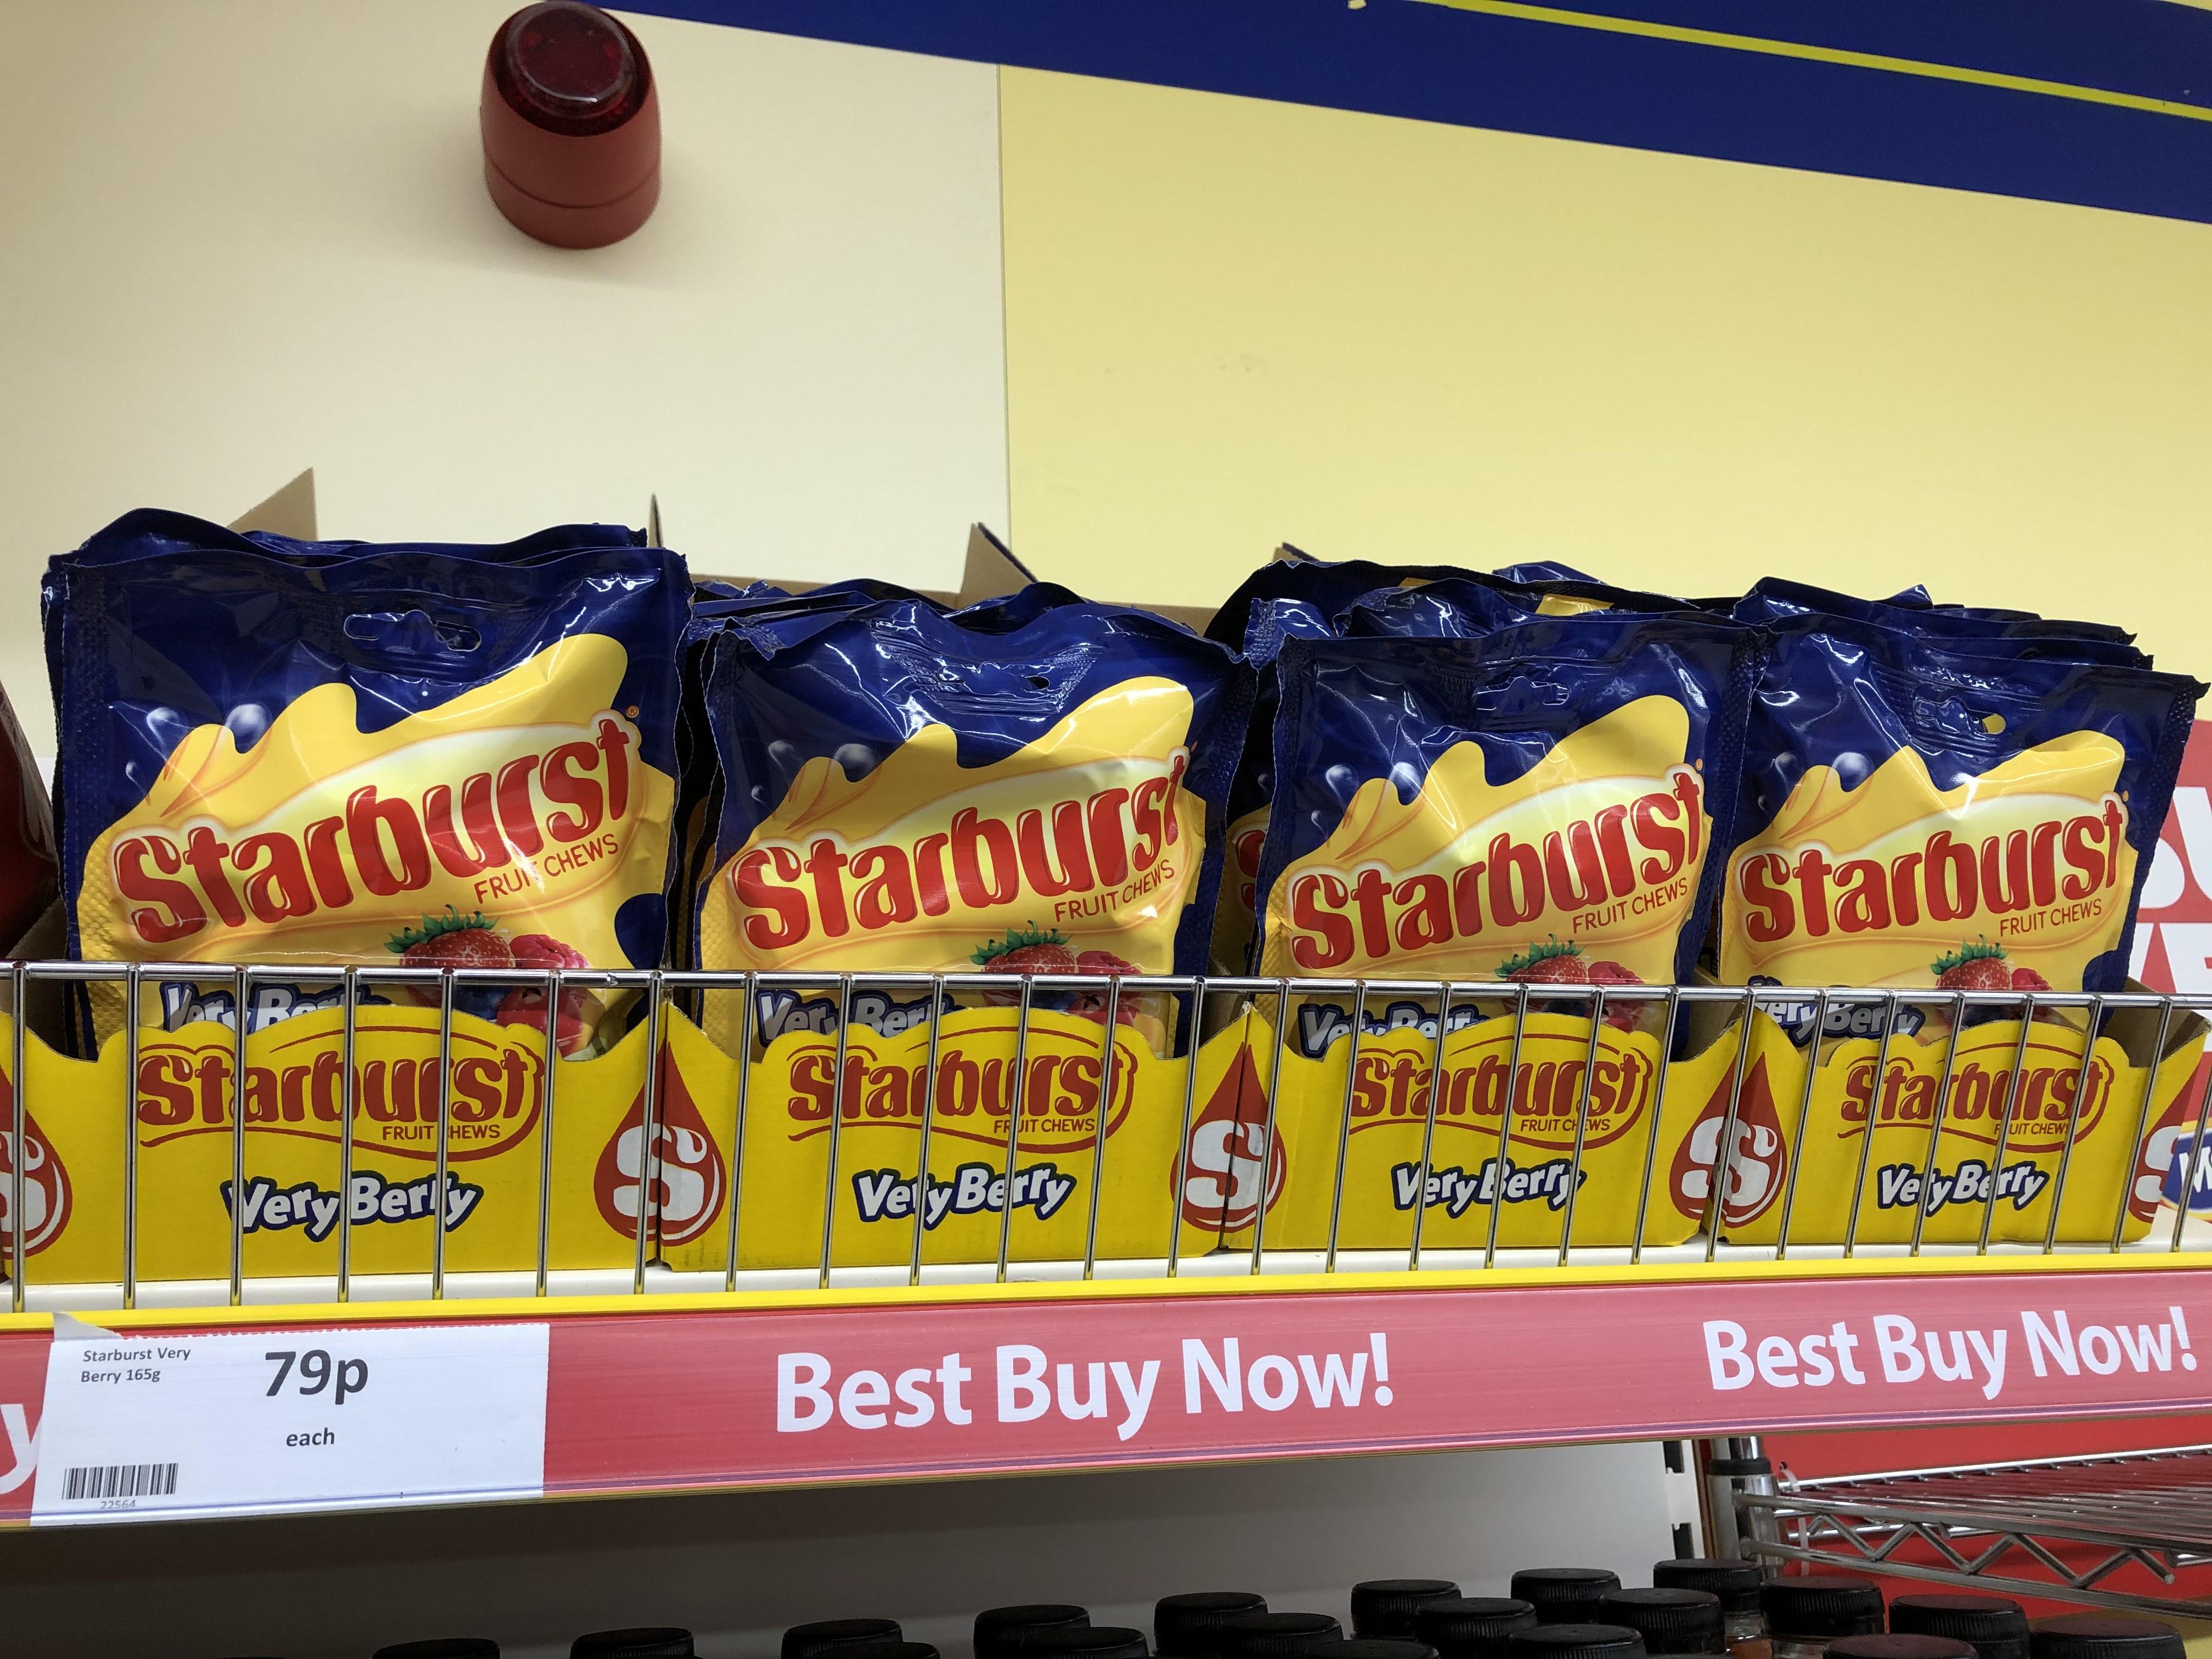 Starburst Very Berry 165g for 79p at Heron Foods Stretford